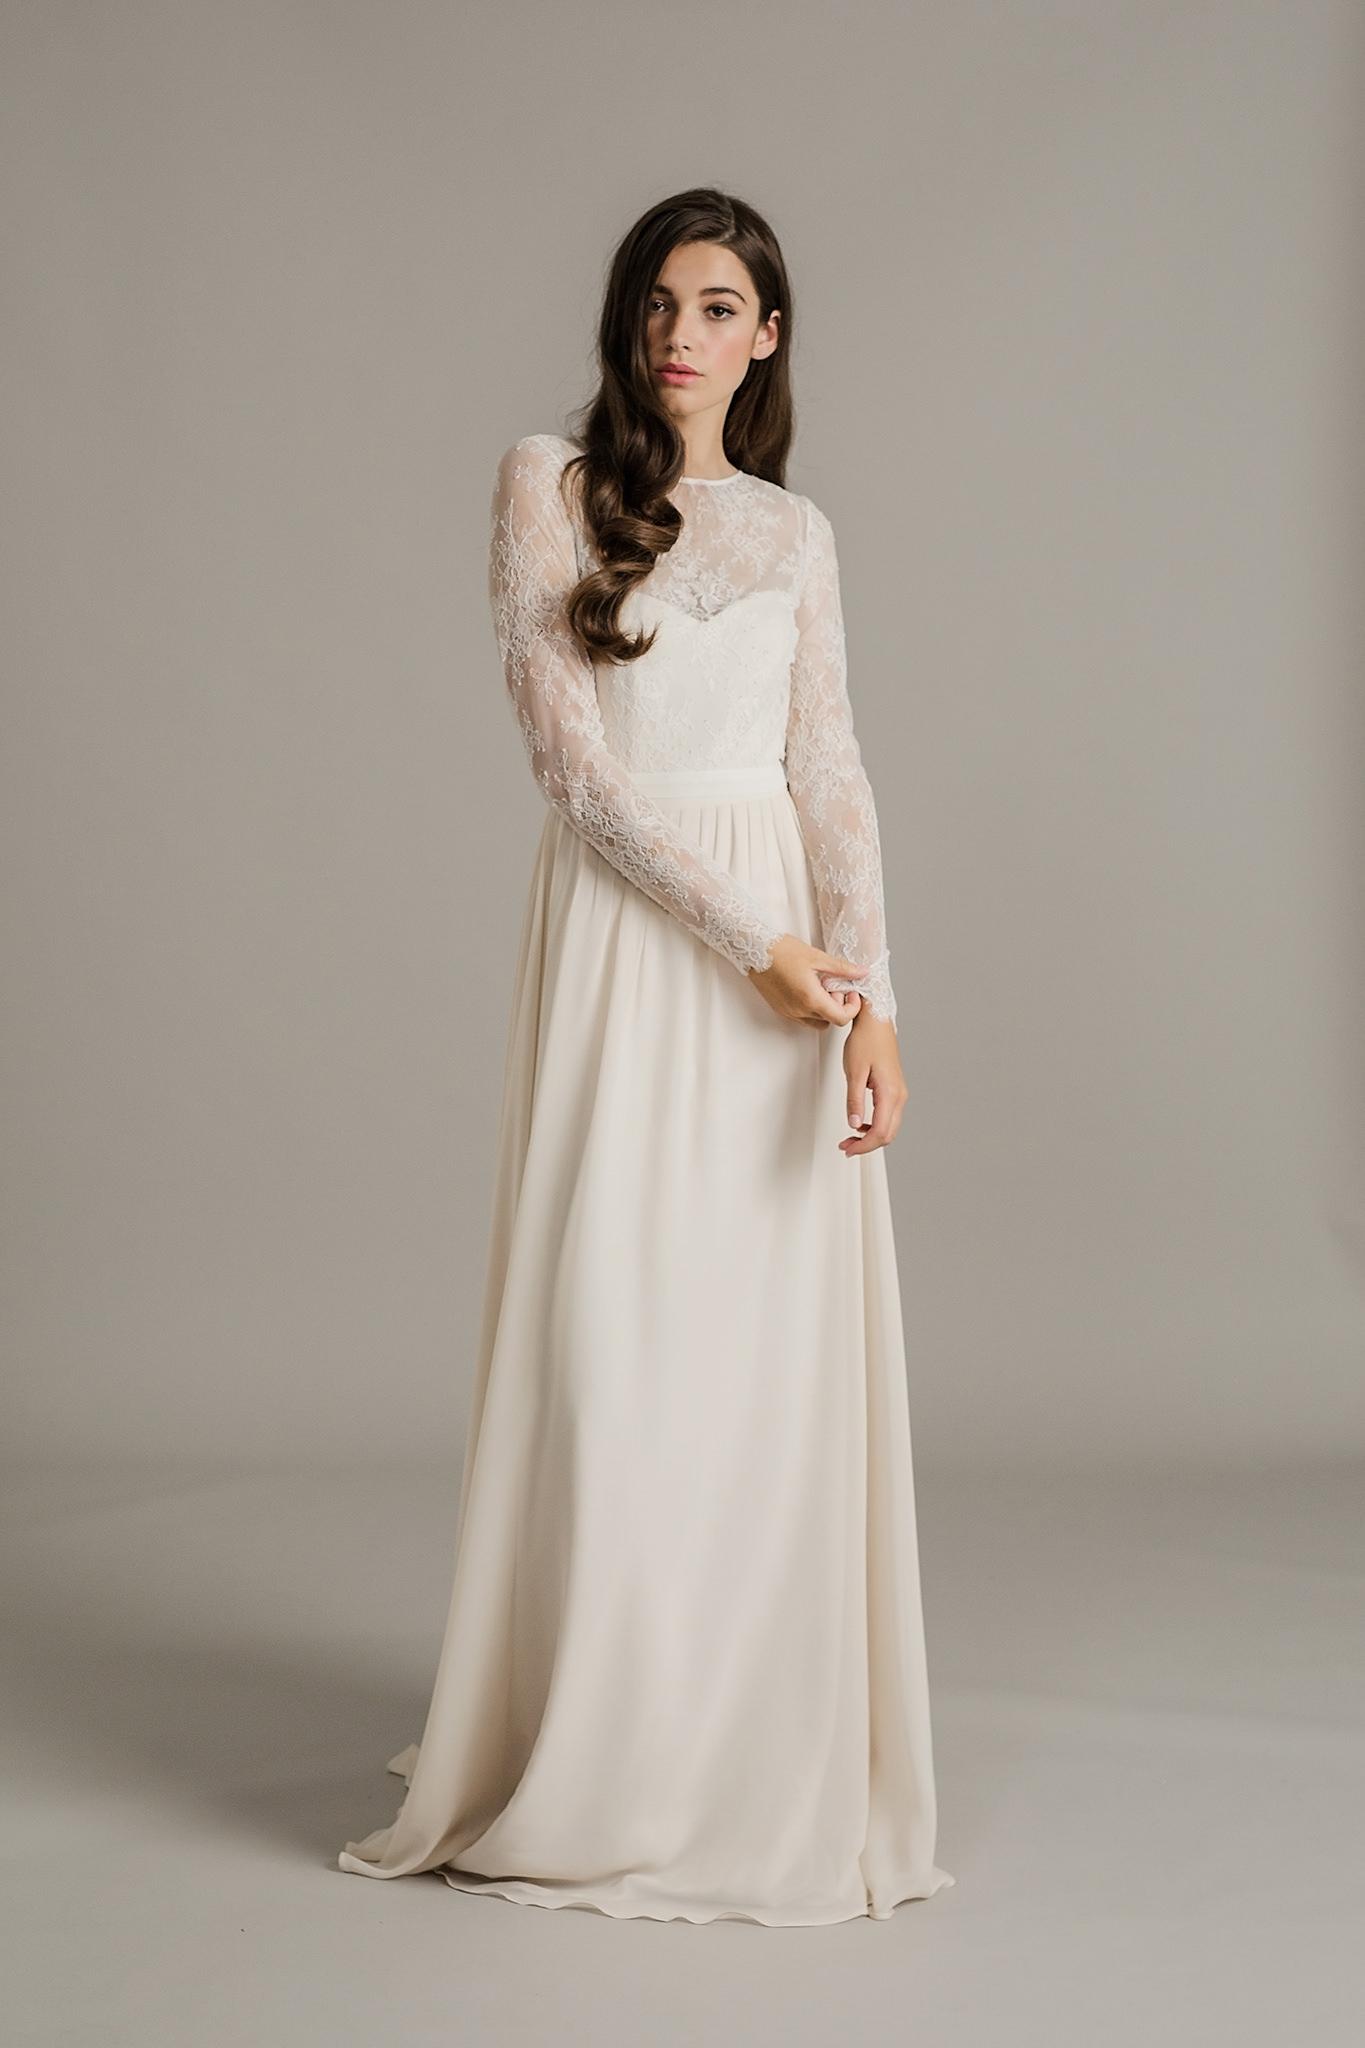 Alice wedding dress by Sally Eagle